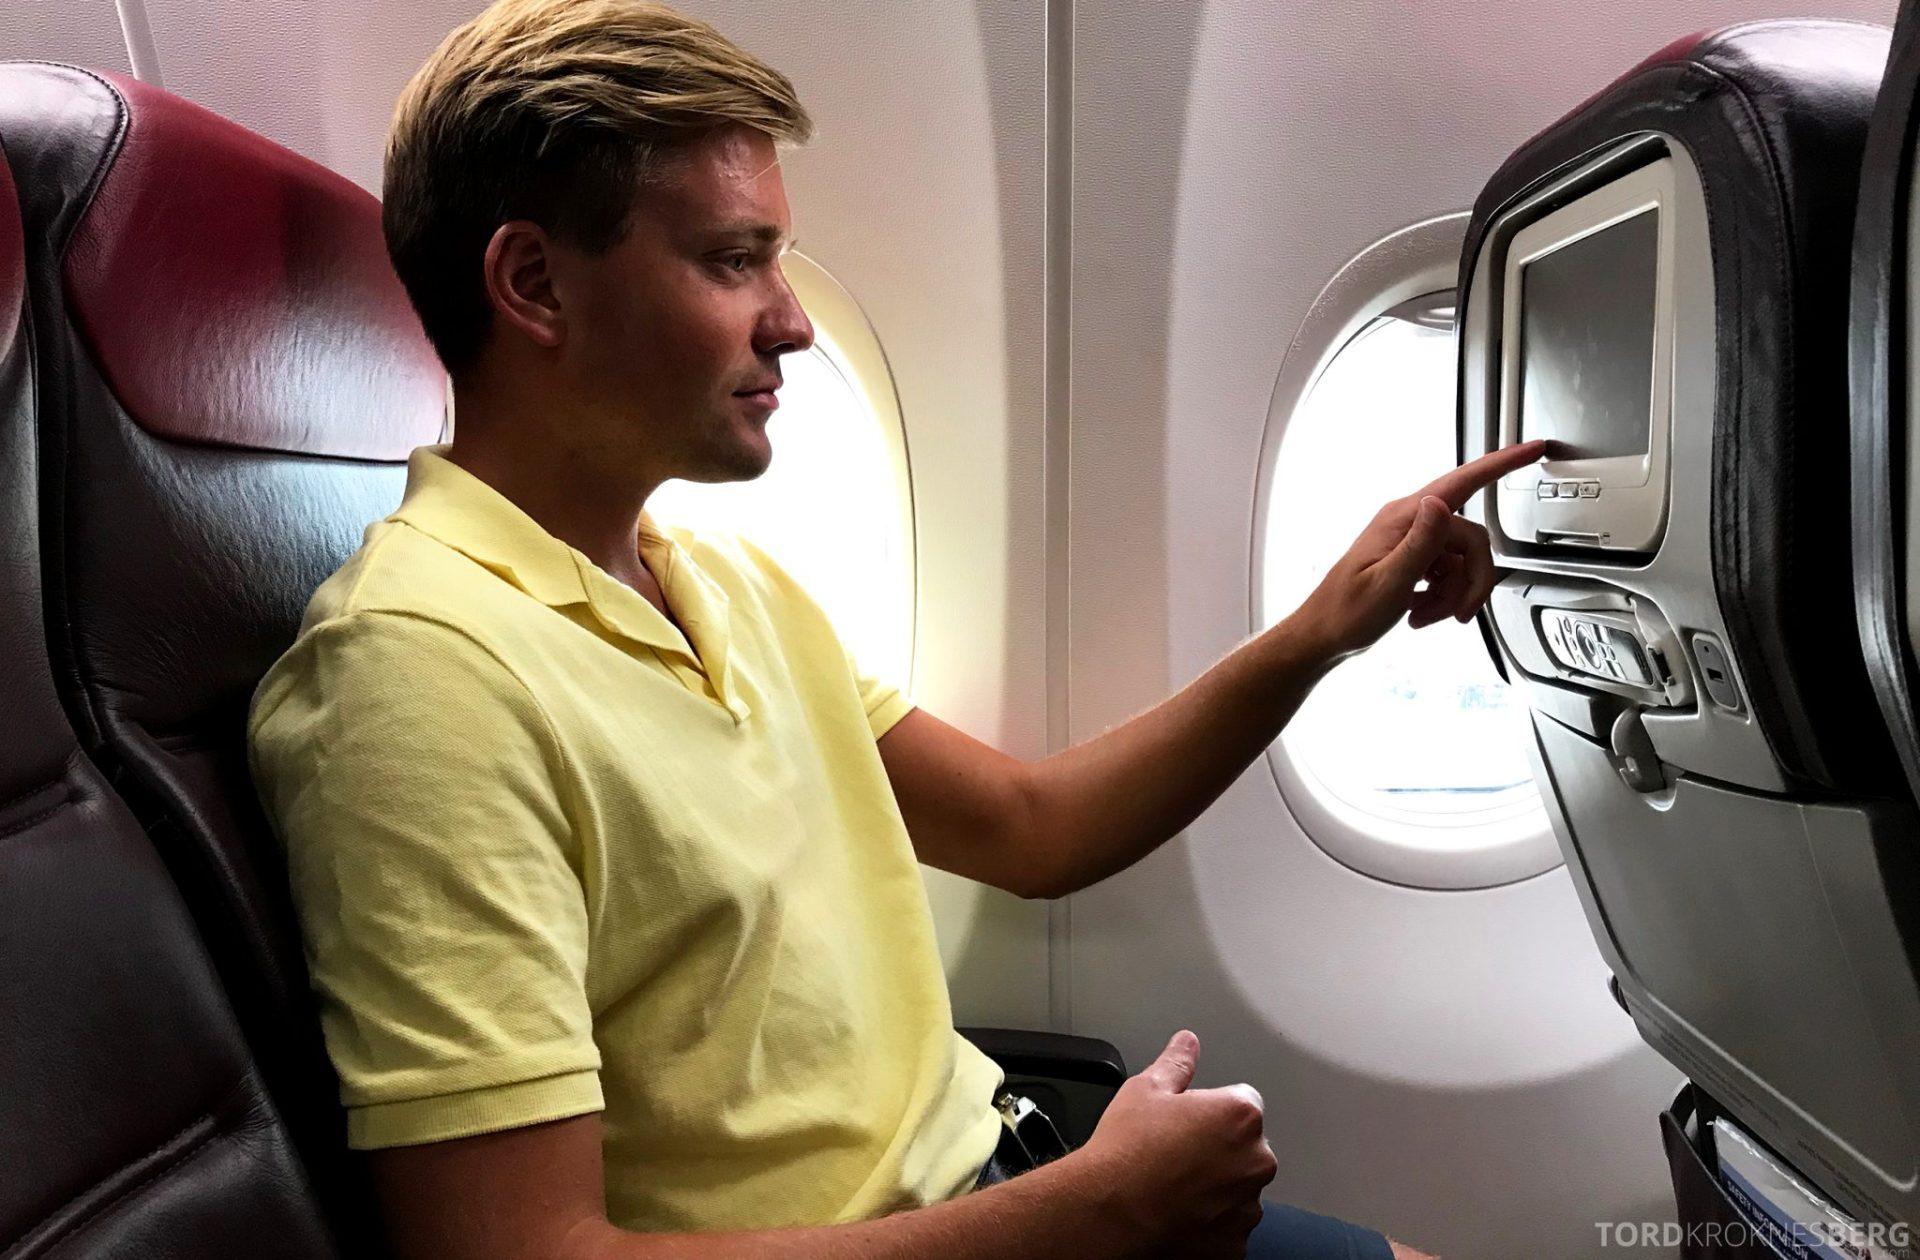 Malaysia Airlines Economy Class Singapore Kuala Lumpur Tord Kroknes Berg